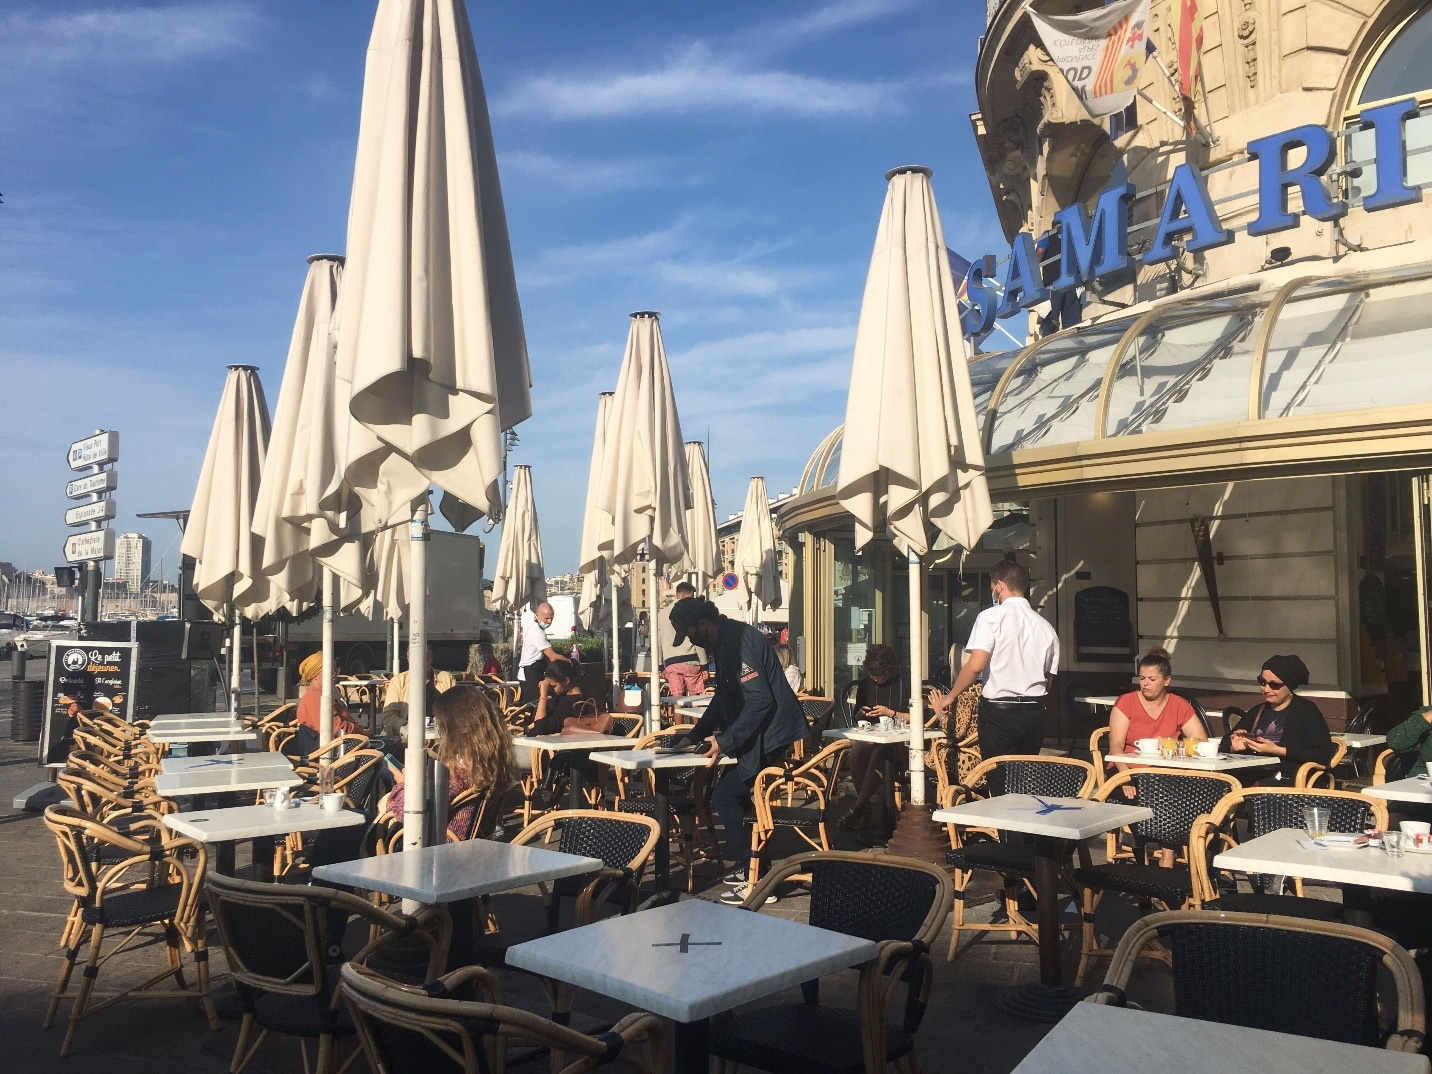 terrasse-cafe-bar-resto-marseille-google-image